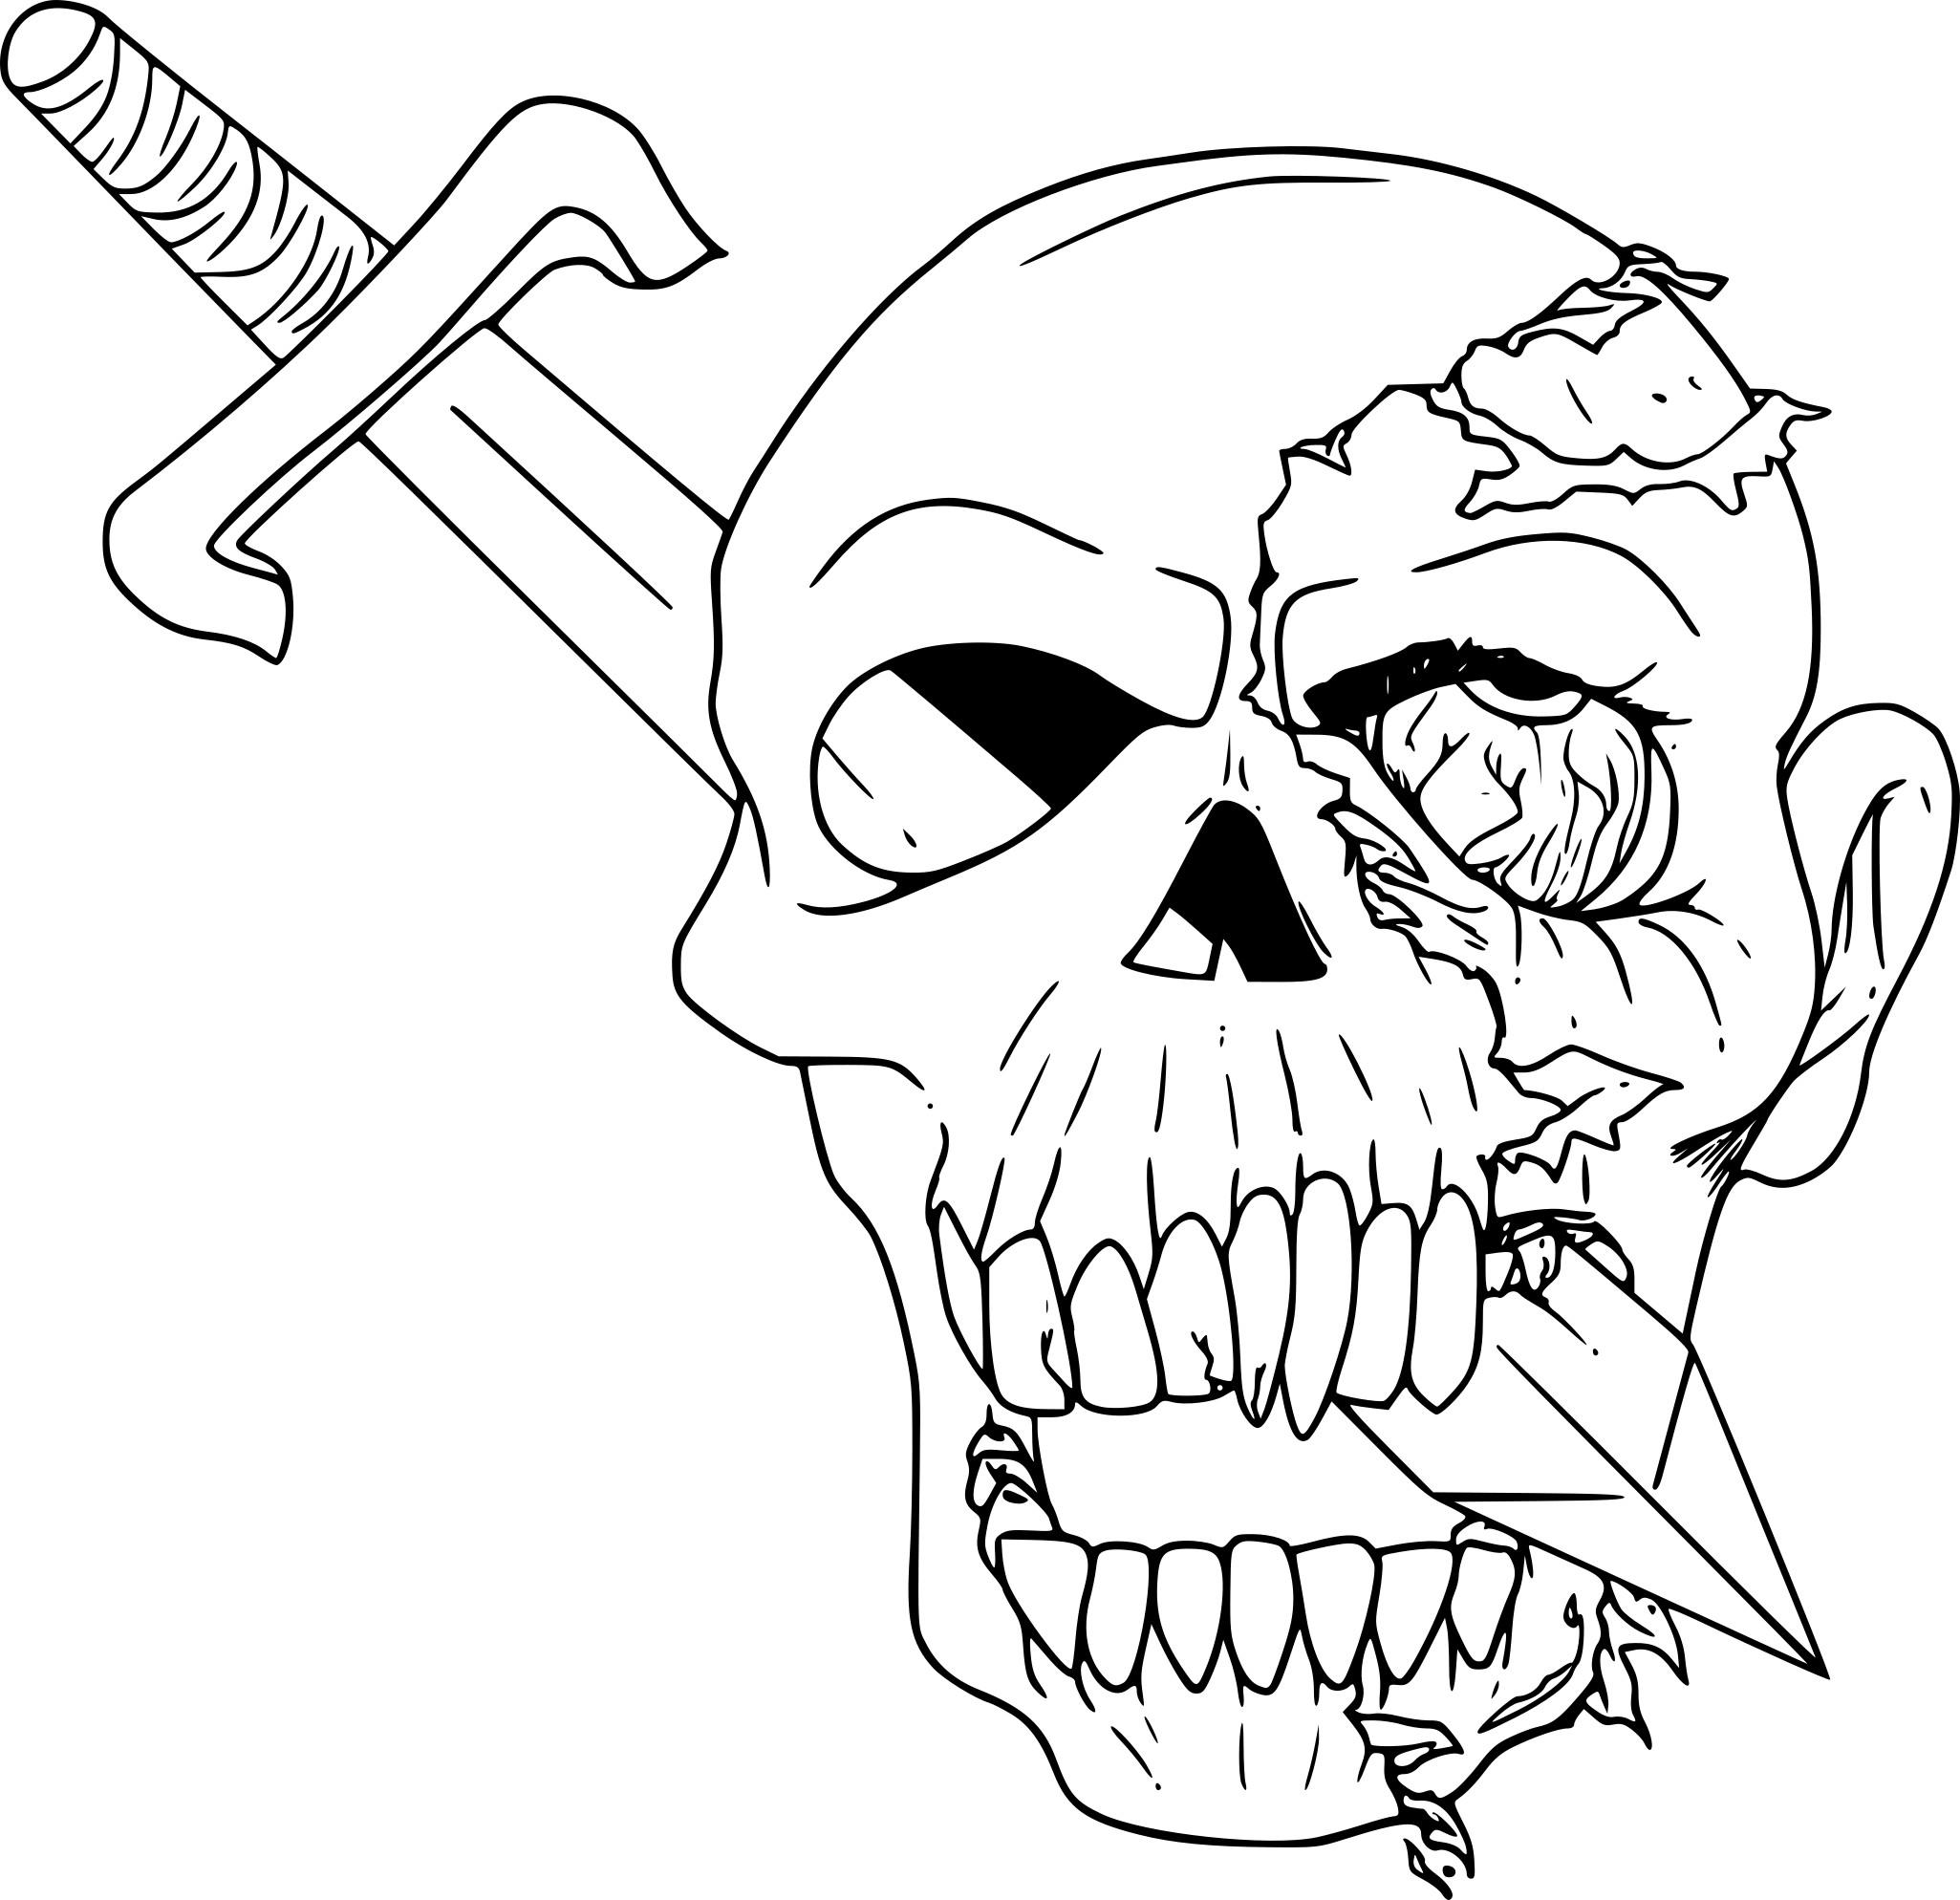 Coloriage crane de pirate à imprimer